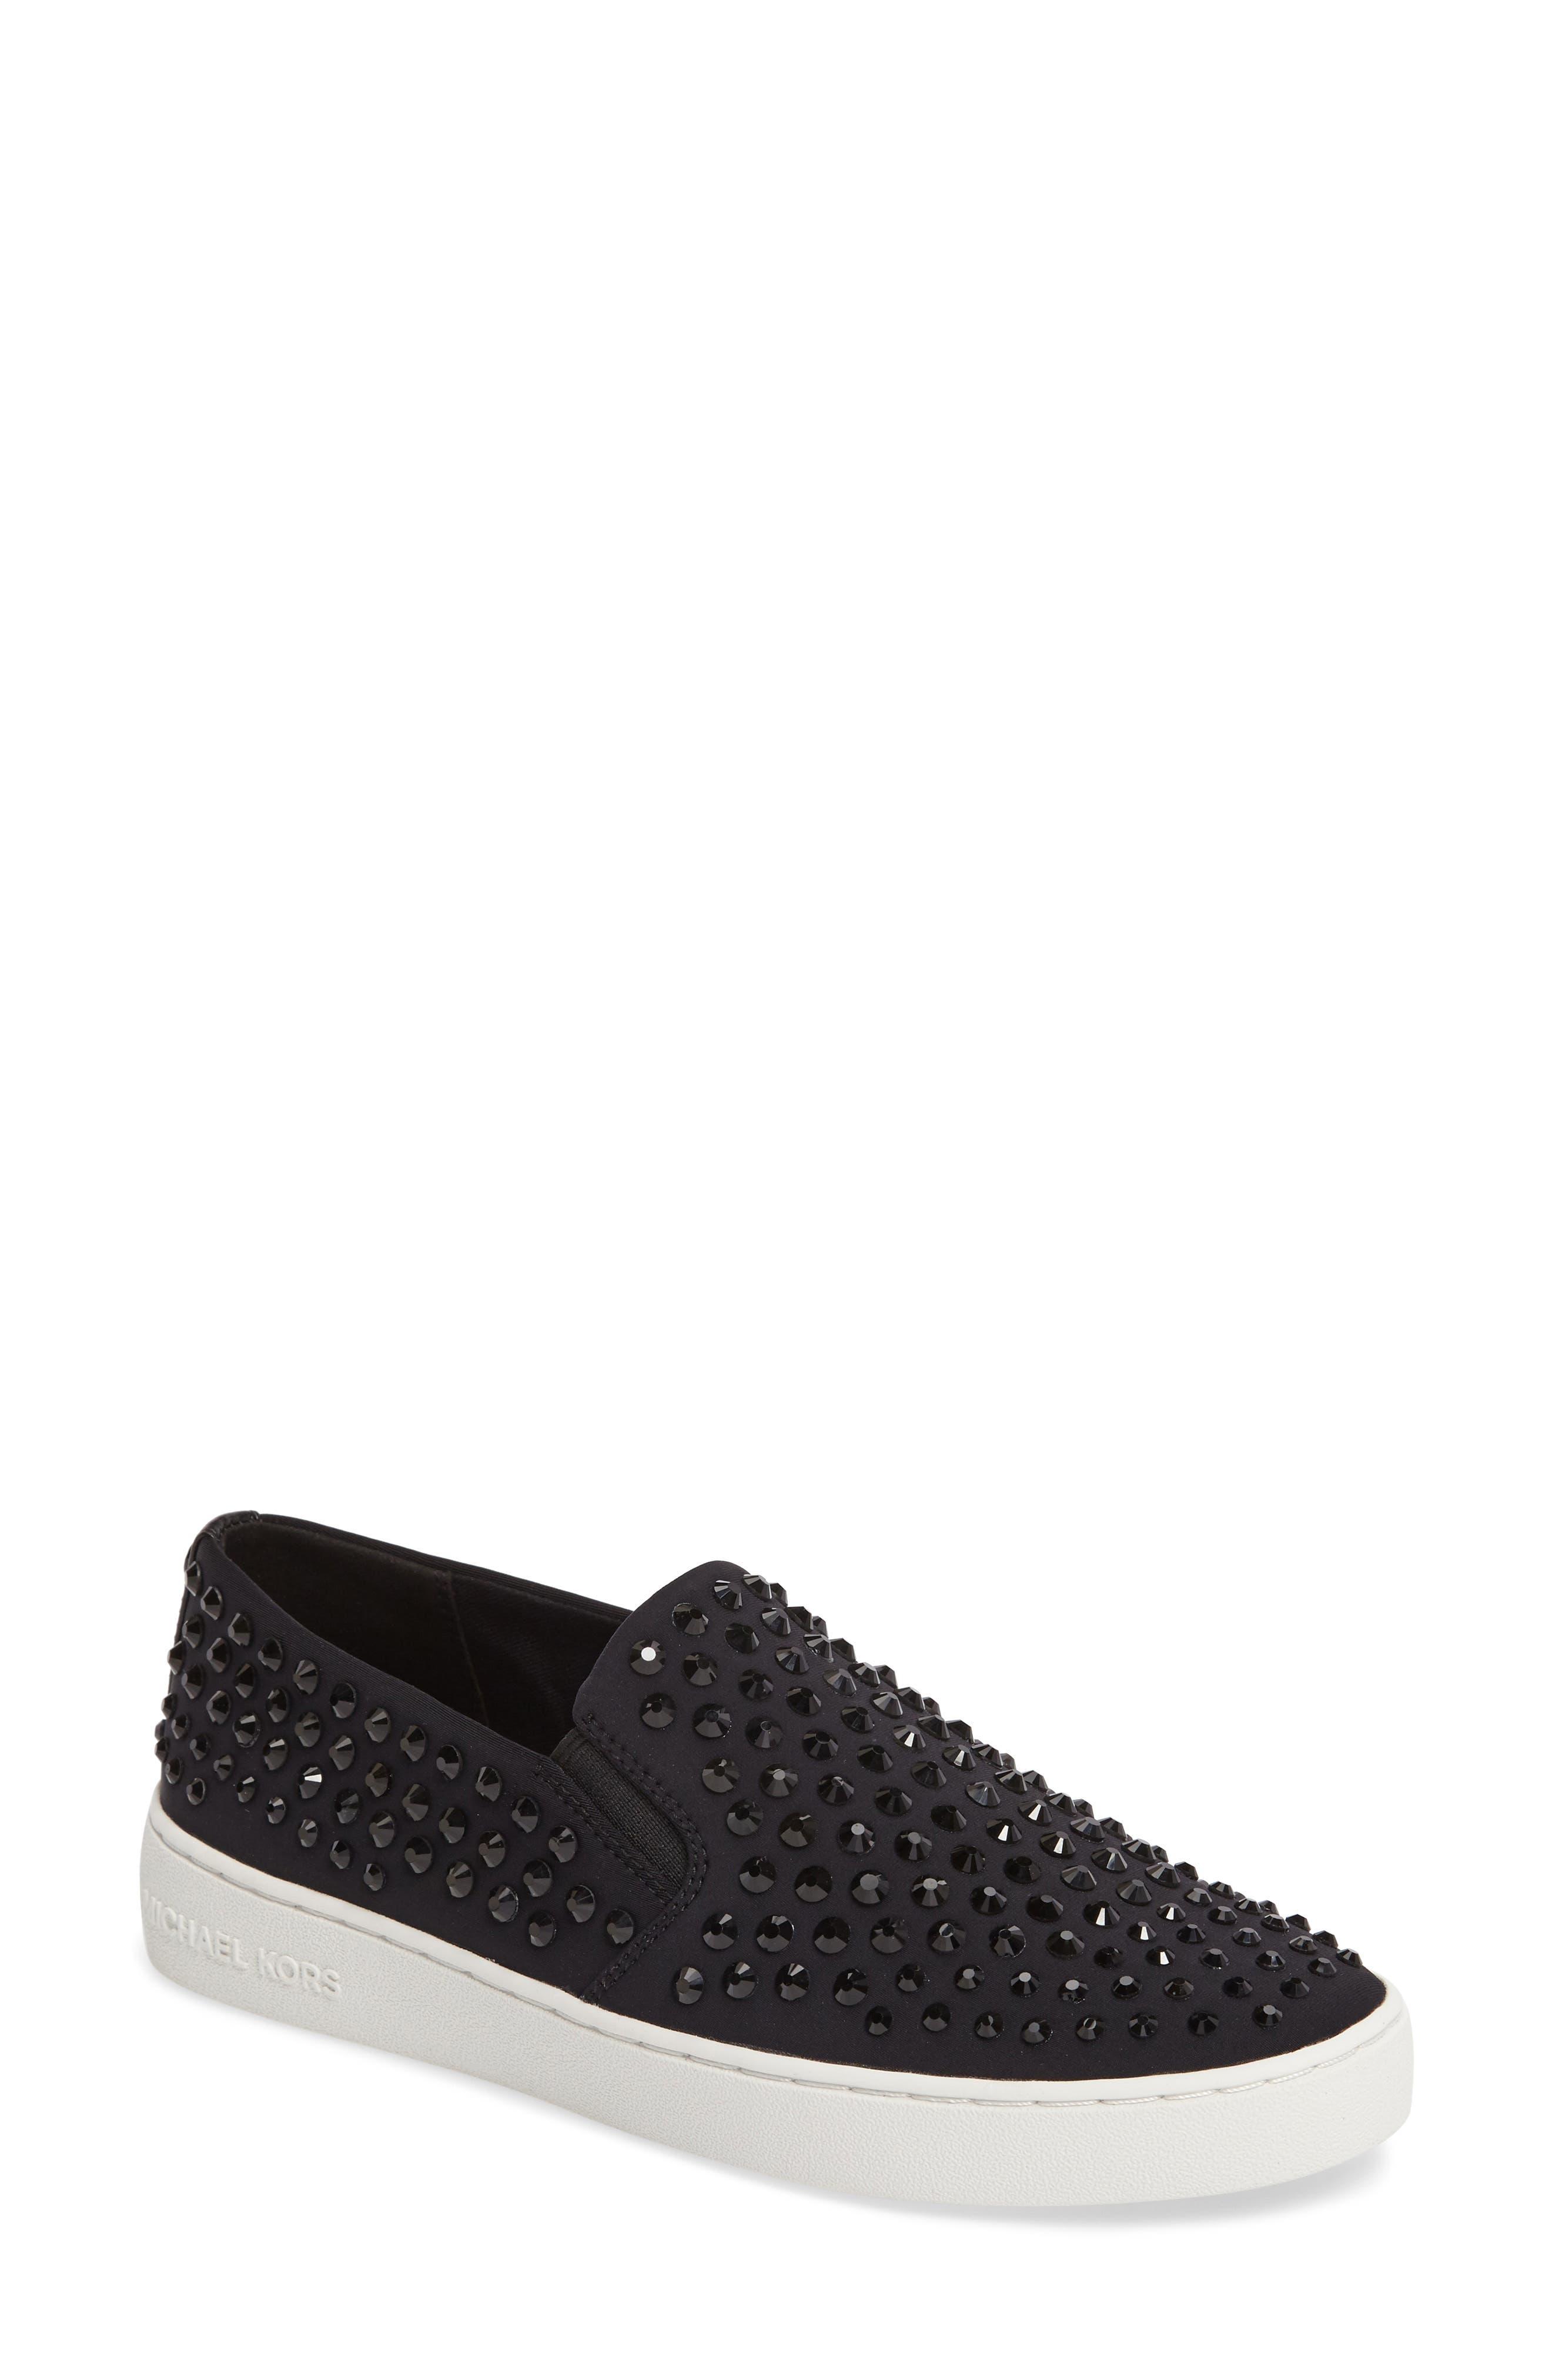 Main Image - MICHAEL Michael Kors Keaton Slip-On Sneaker (Women)